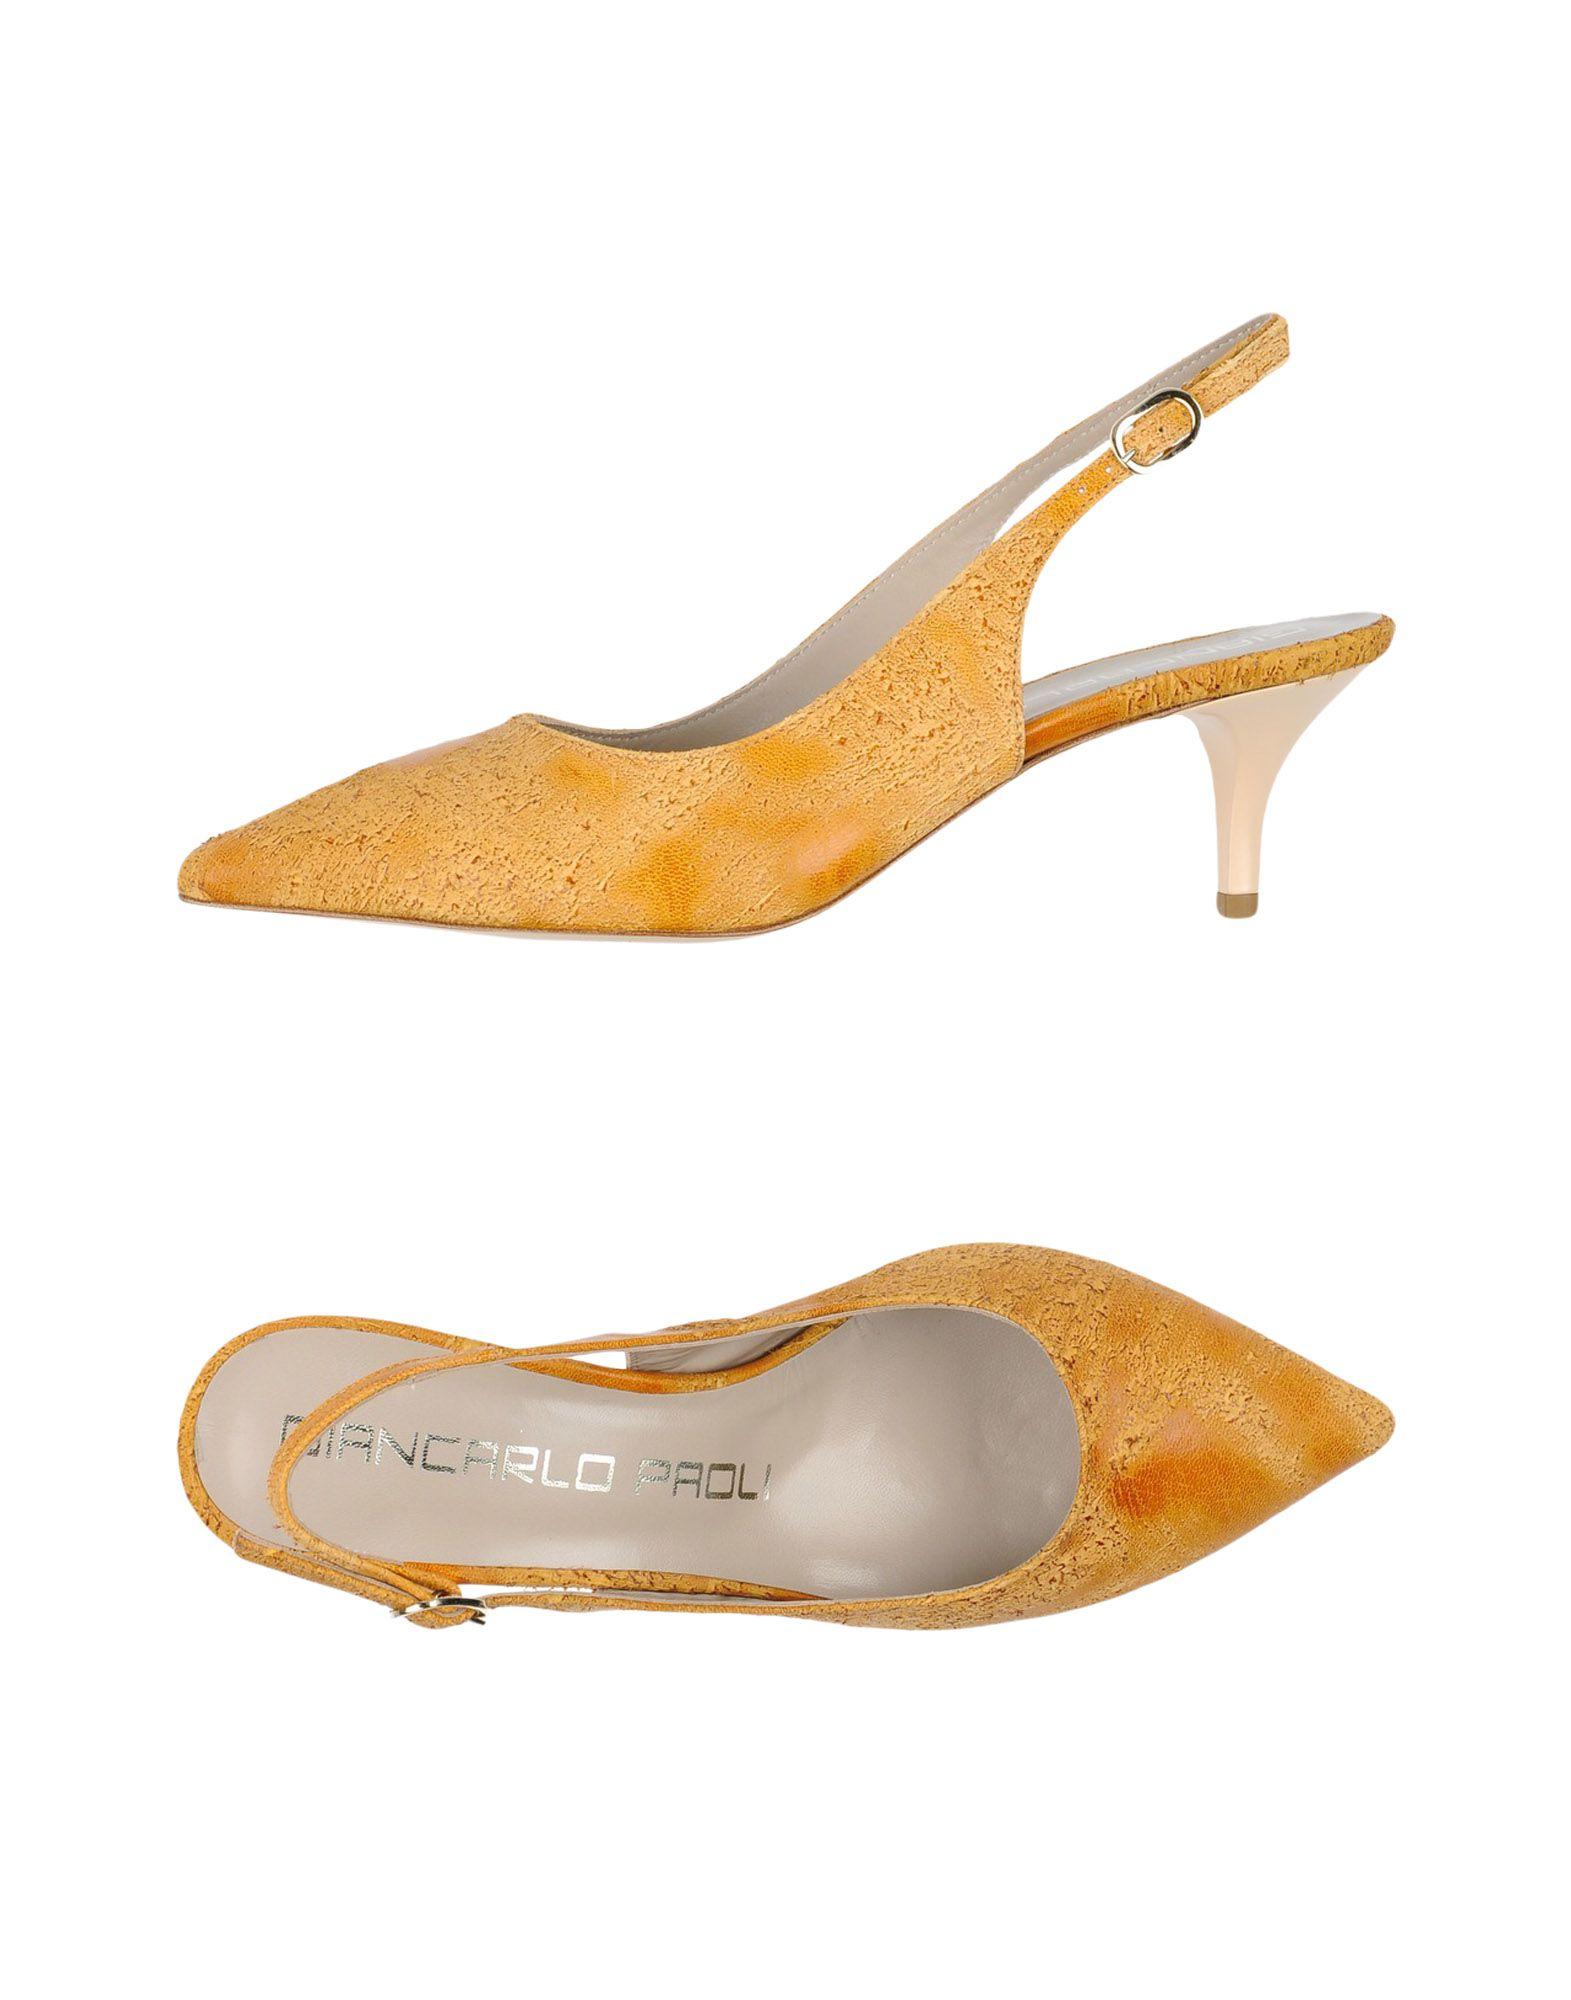 Giancarlo Paoli Pumps Damen  11337217WS Gute Qualität beliebte Schuhe